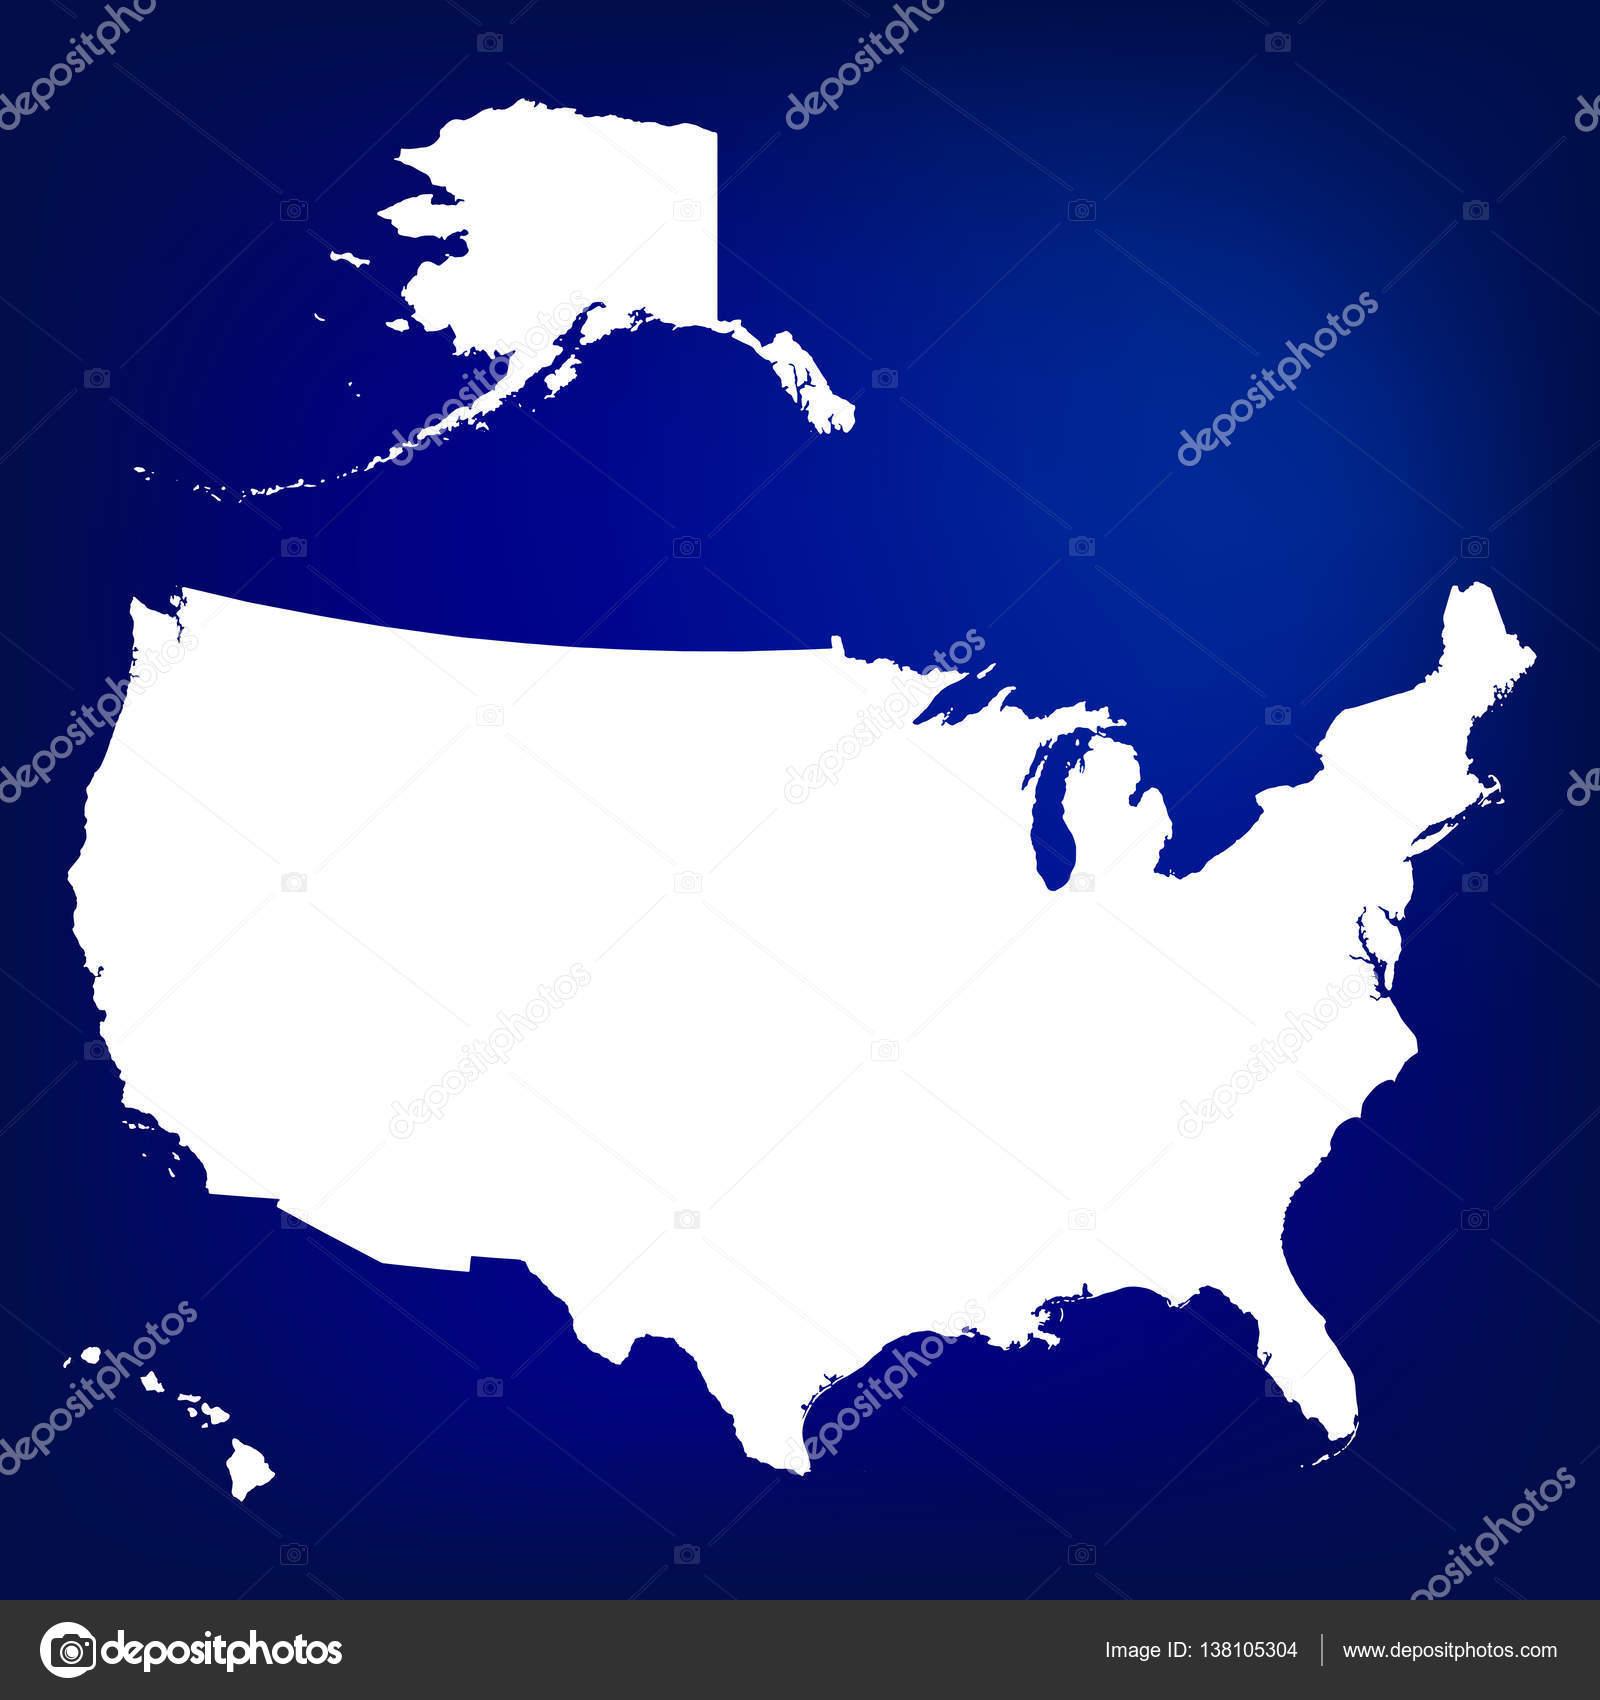 Map of USA including Alaska and Hawaii. Blank similar USA map ...